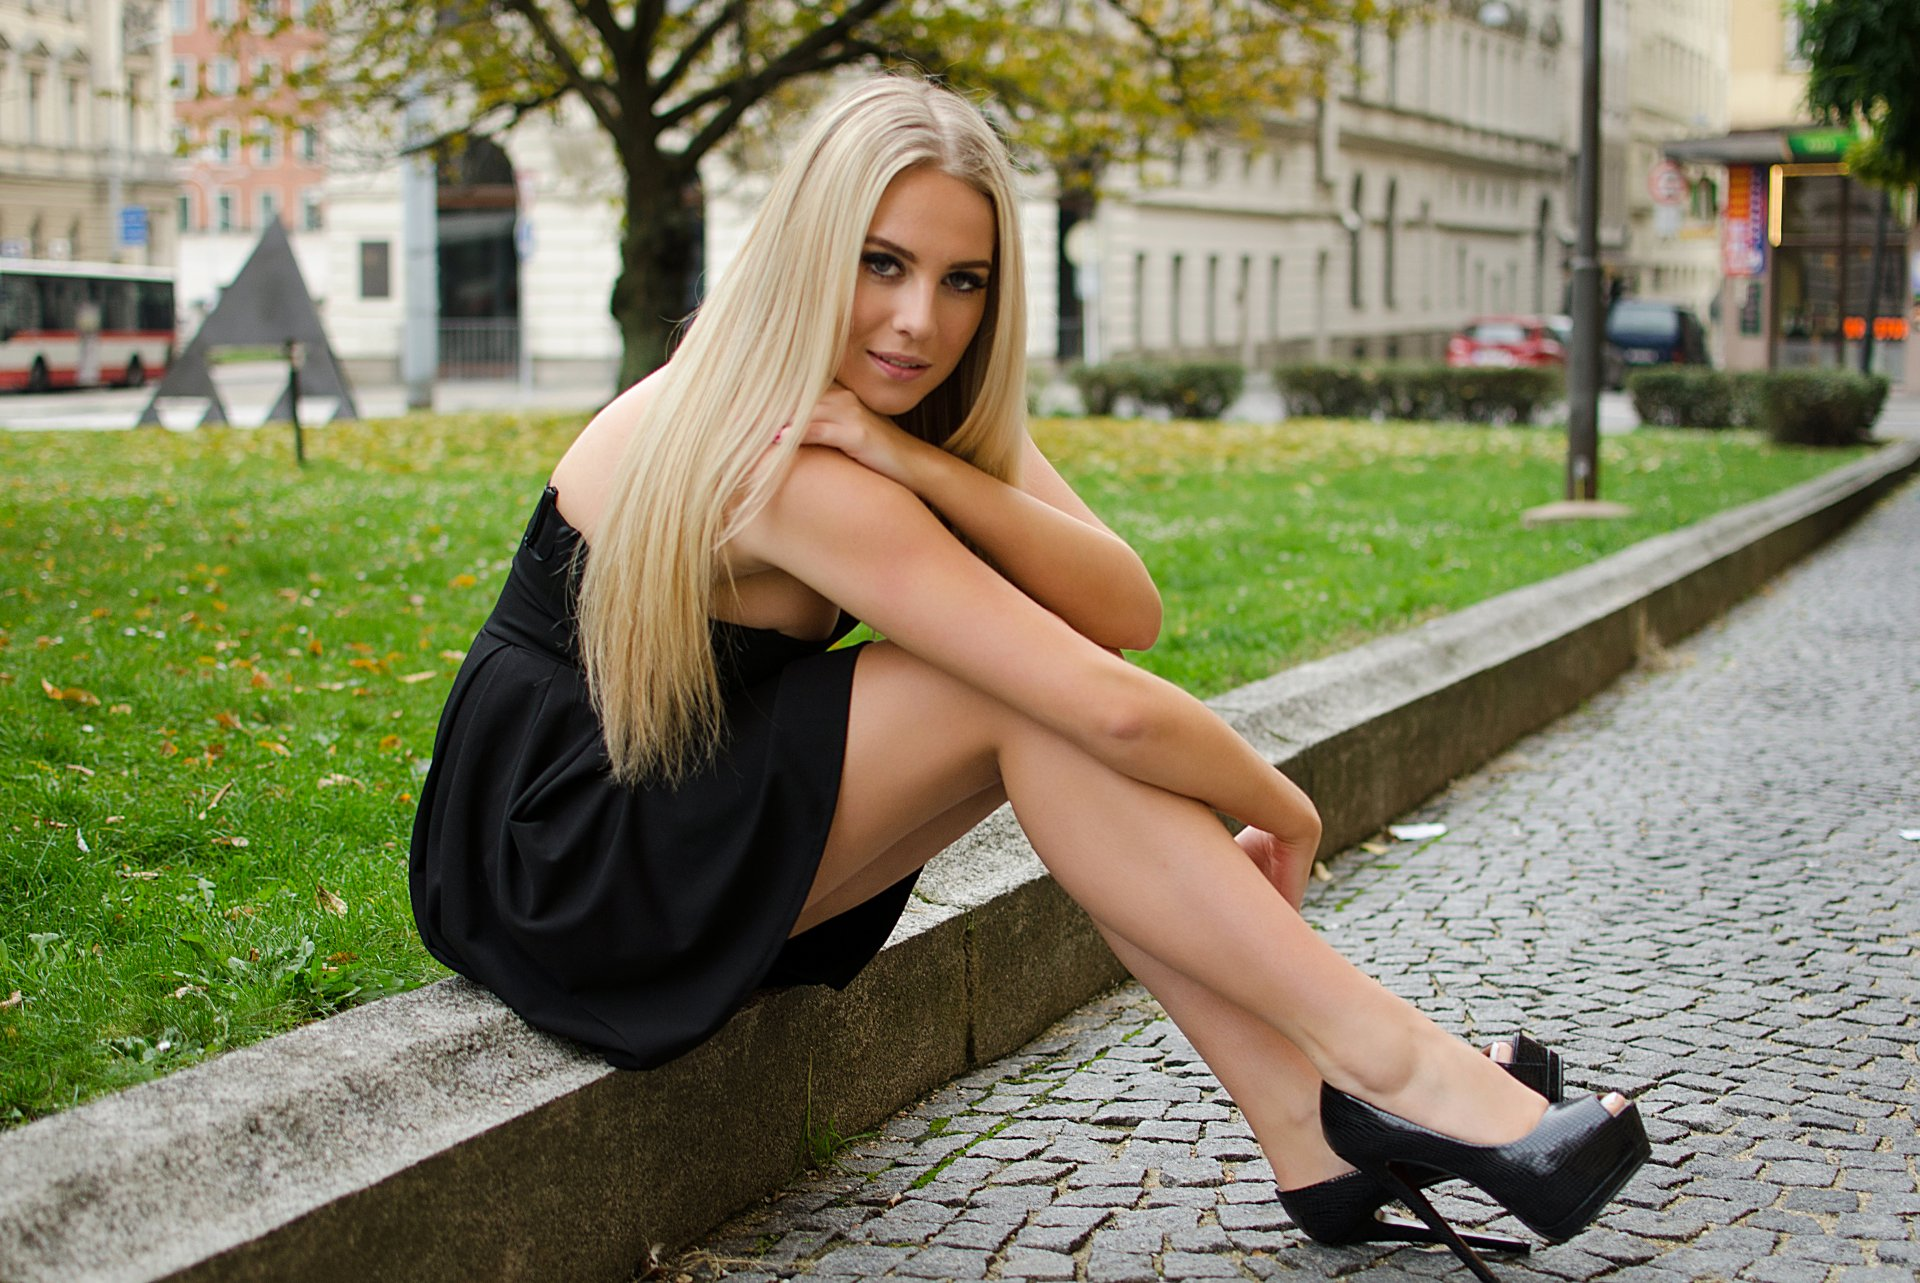 девушка красавица город улица поребрик блондинка ноги взгляд красота.